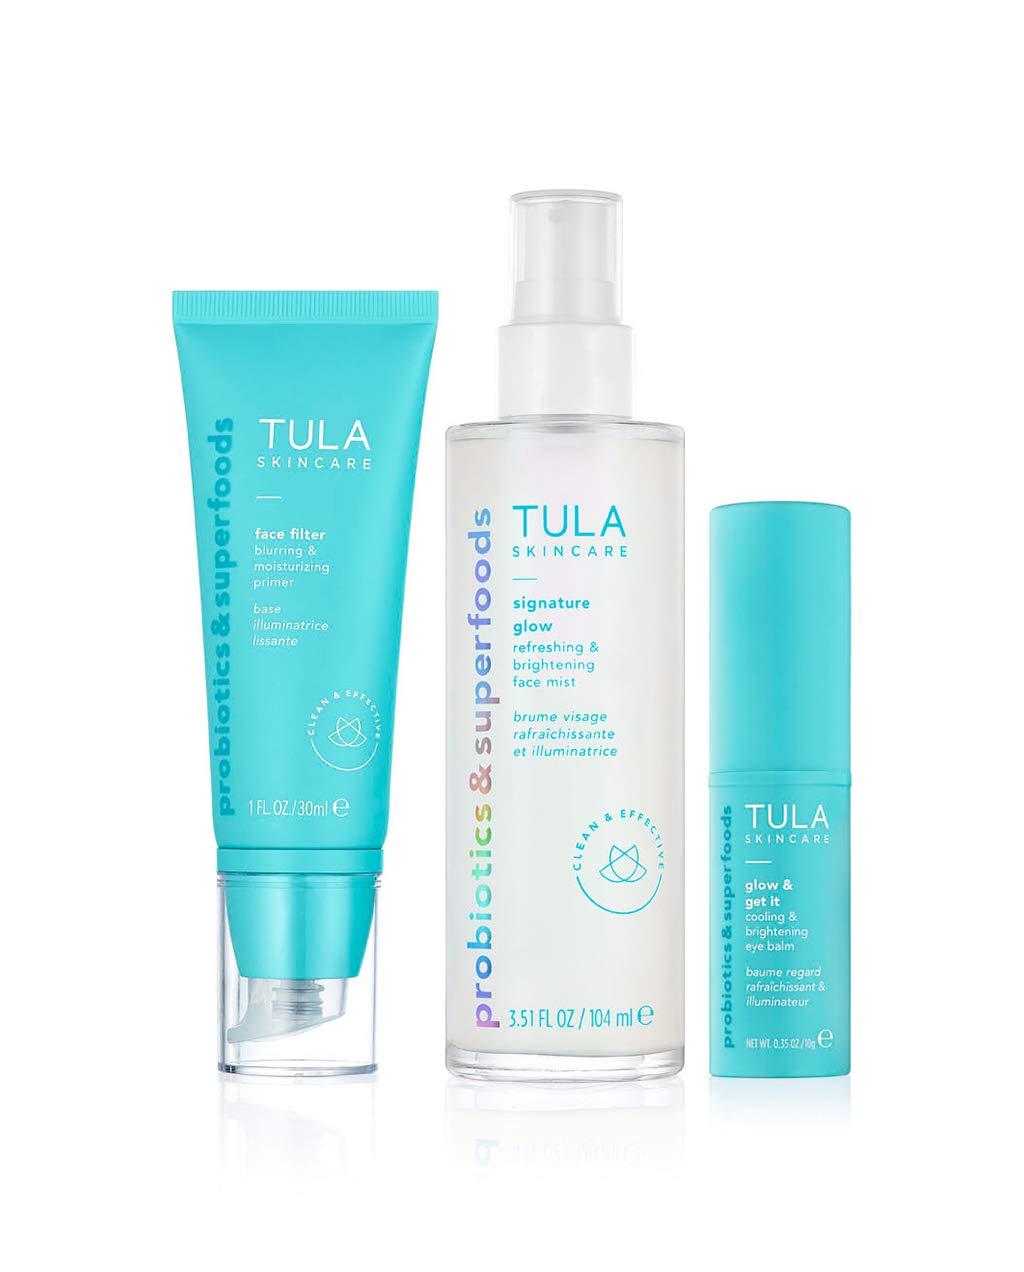 TULA Skin 毎日がバーゲンセール セール特価 Care No-Makeup Skincare Ey Essentials Mist Kit Face